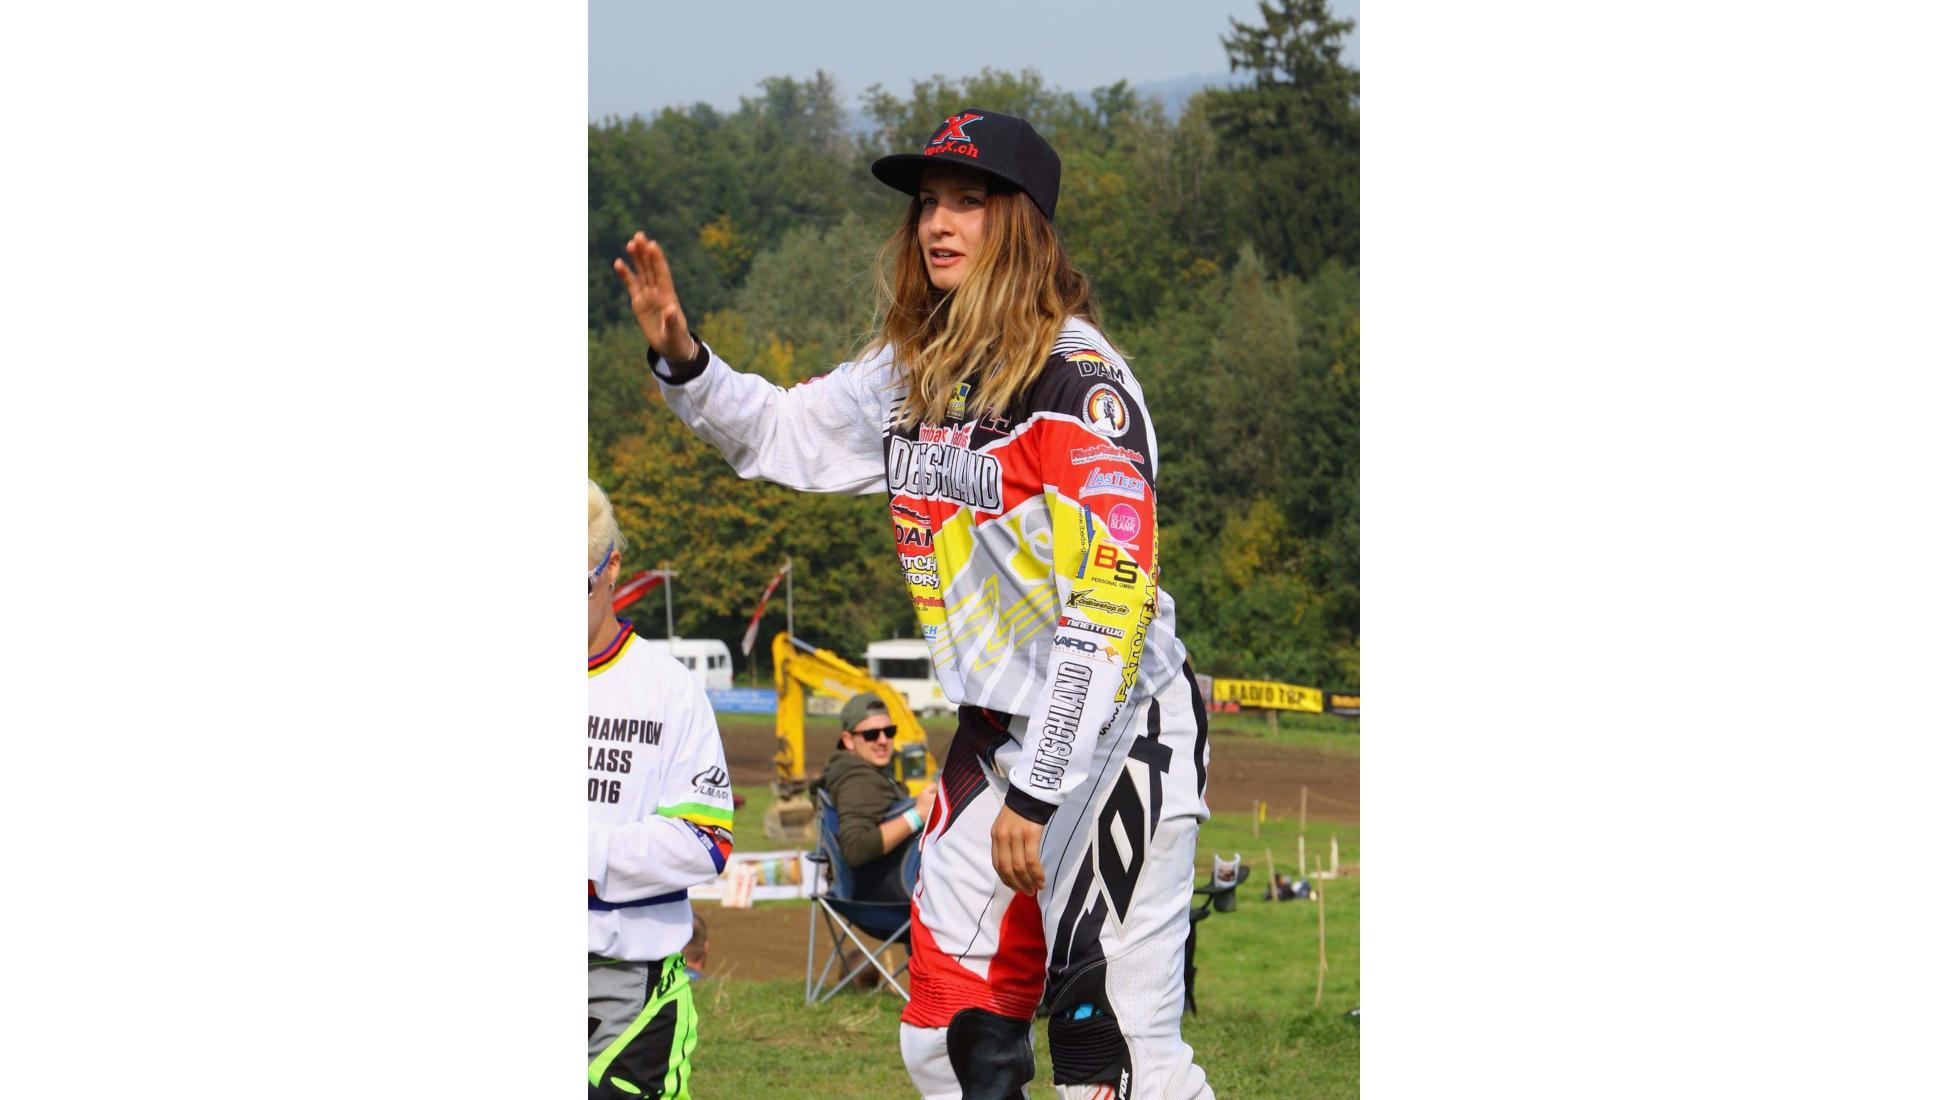 Meine Meisterschaften - Nina - Fotograf: Mike Mazout, Belgium - Motocross-Adventskalender - miradlo Versanddepot